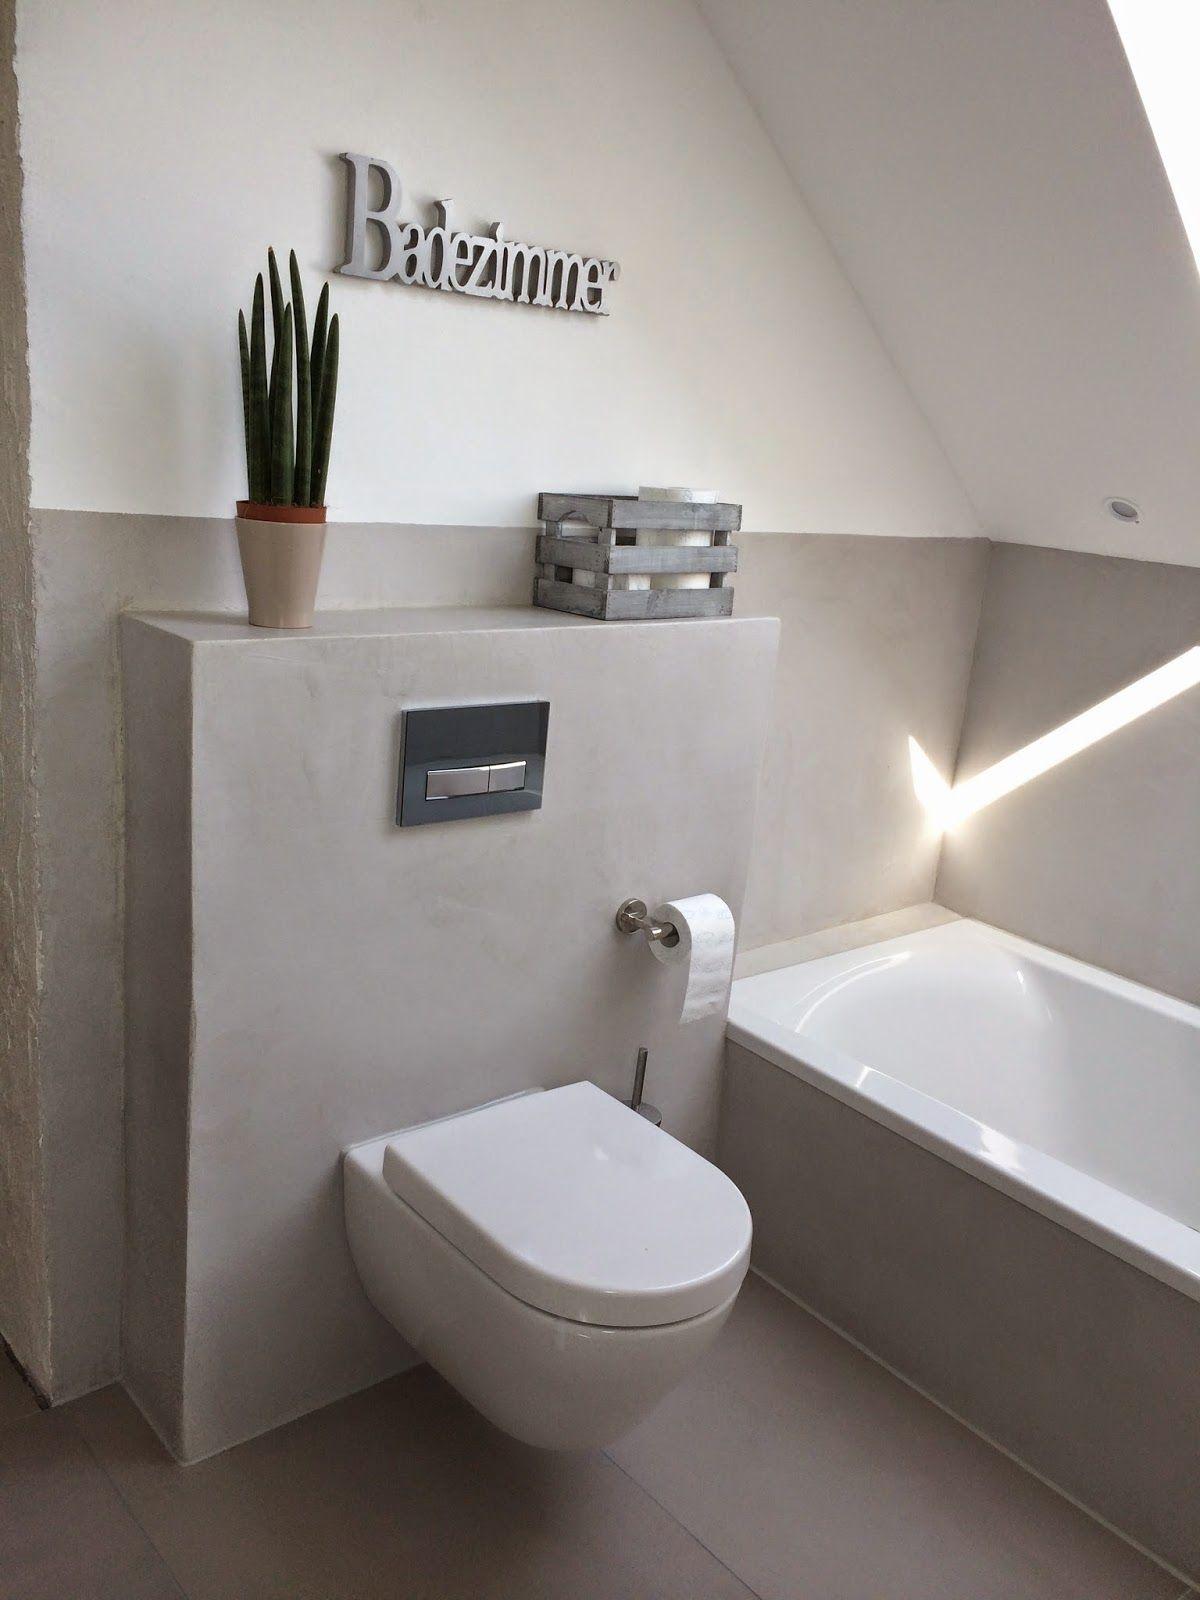 Alte wohndesign bilder wandwohndesignbetoncire september   bad  pinterest  bath